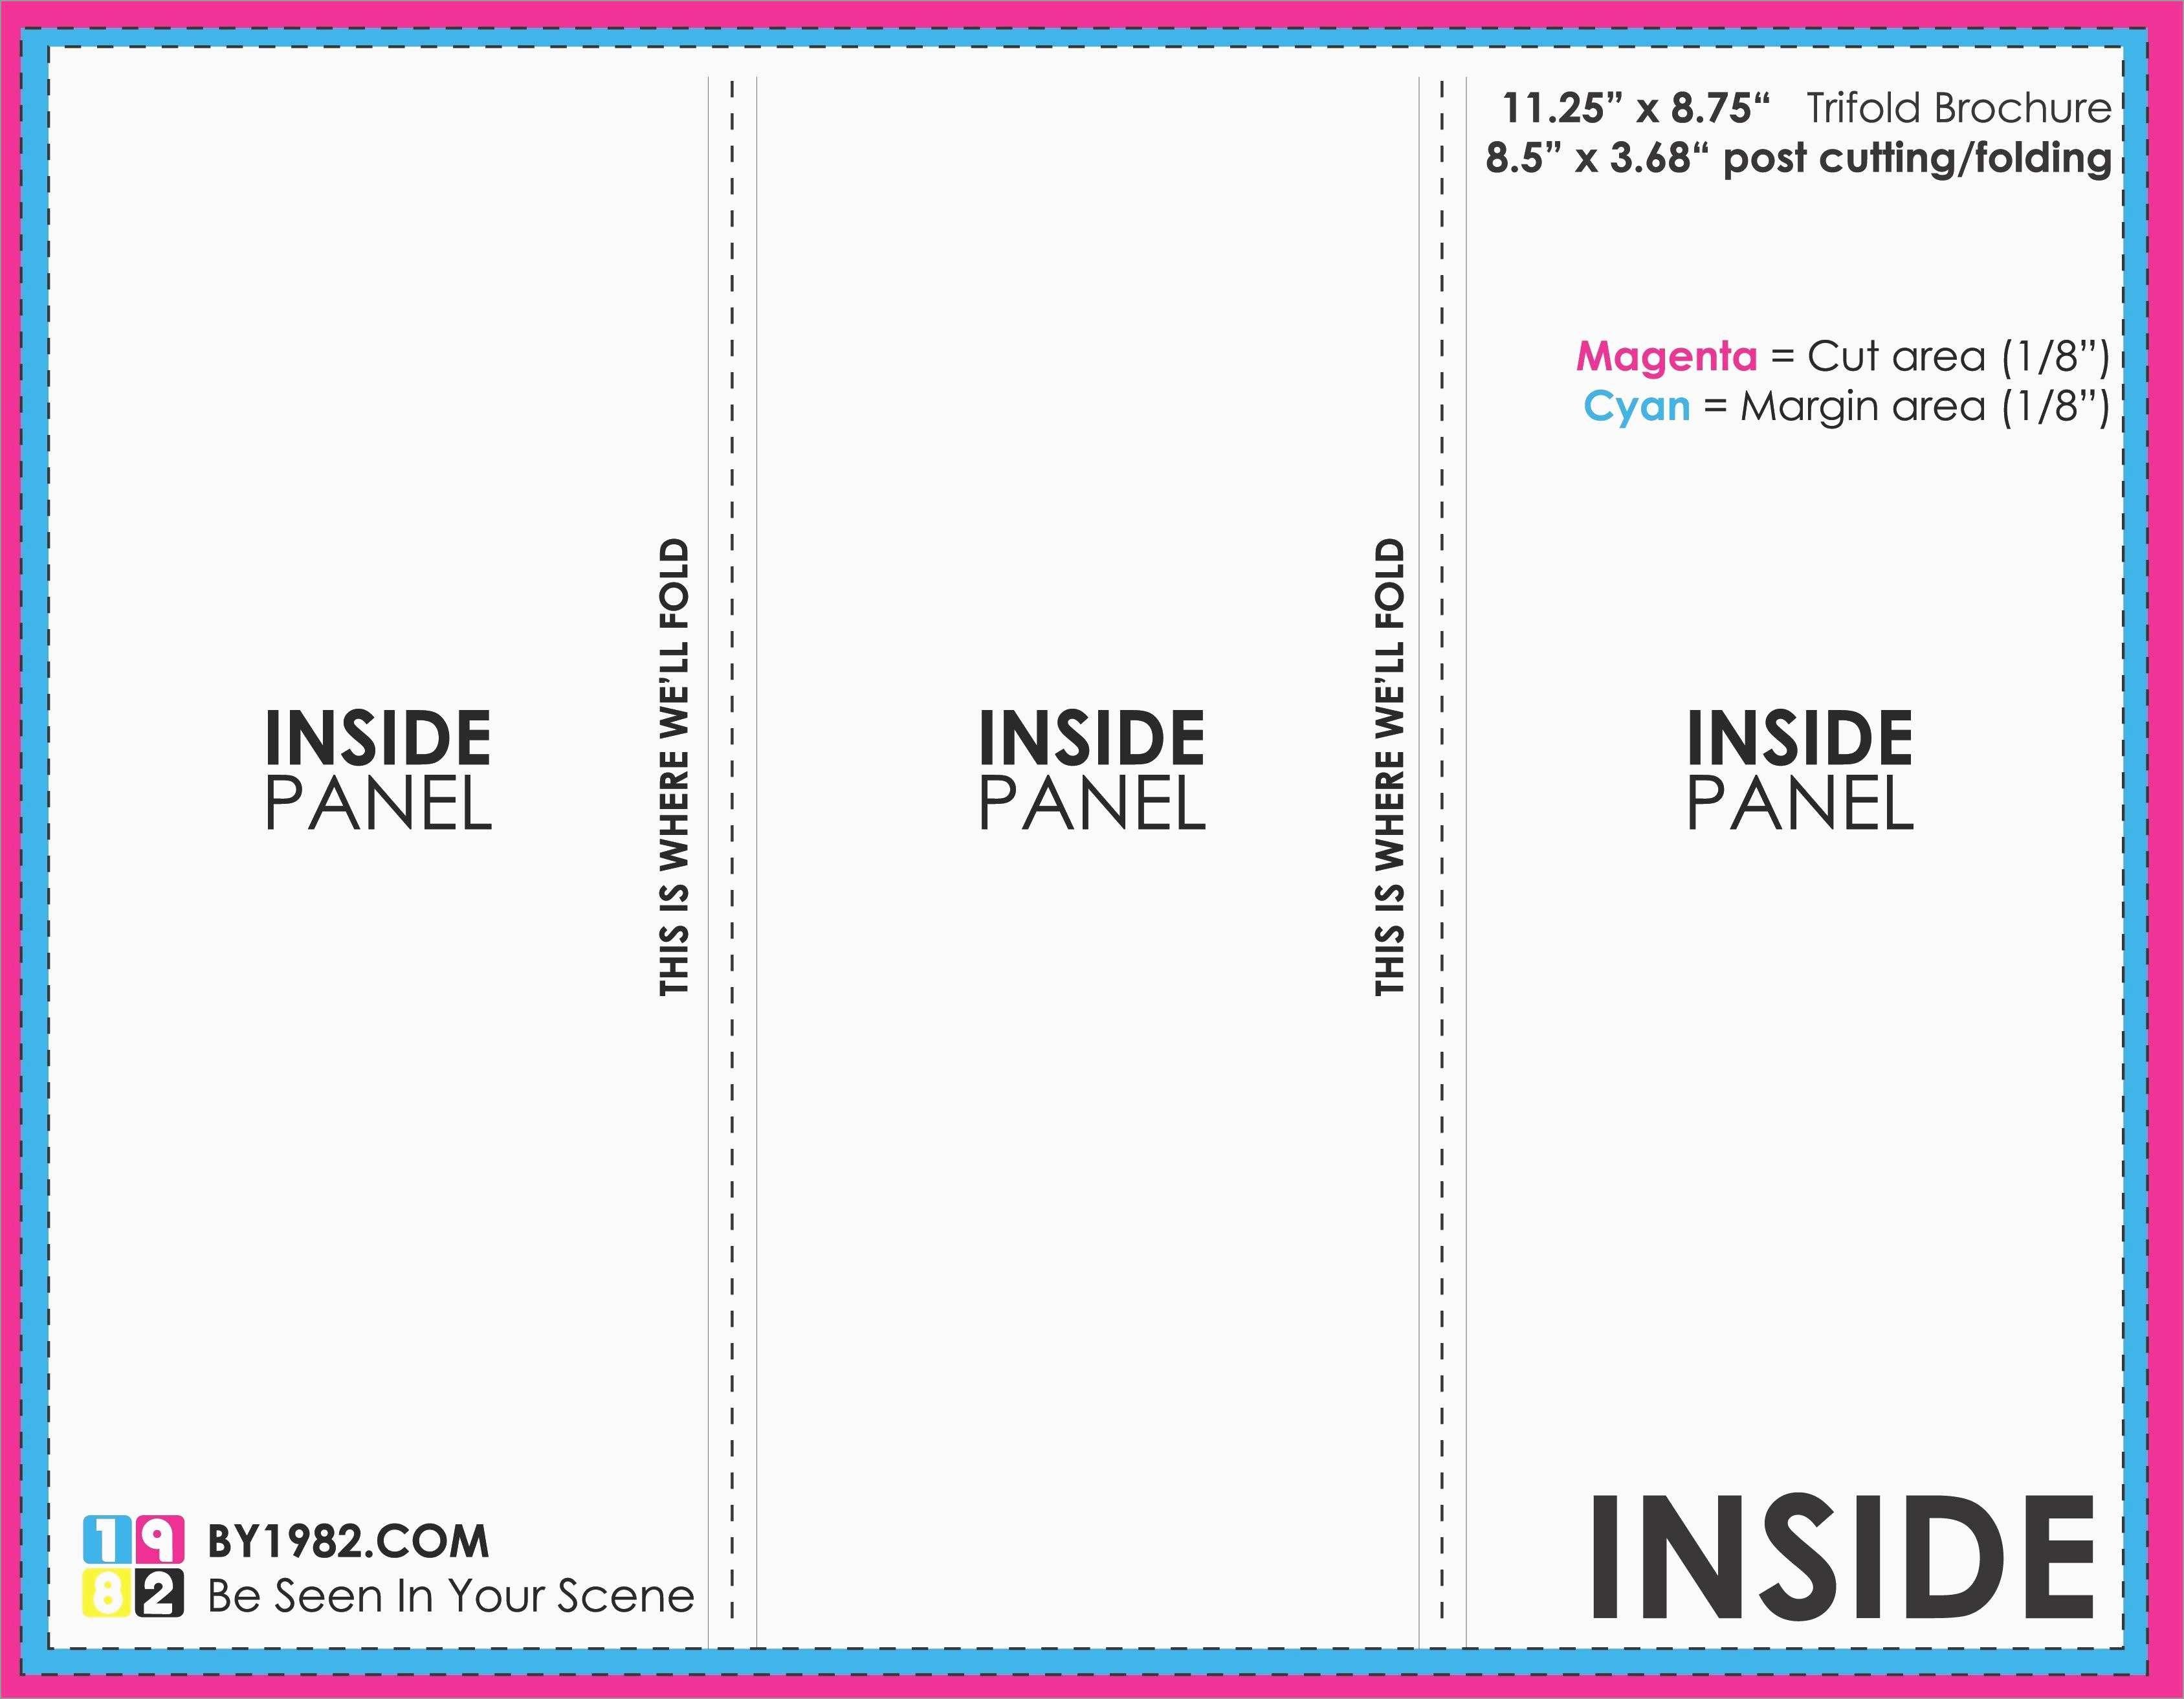 Inspirational Free Tri Fold Brochure Template Google Docs  Best Of Inside 6 Panel Brochure Template